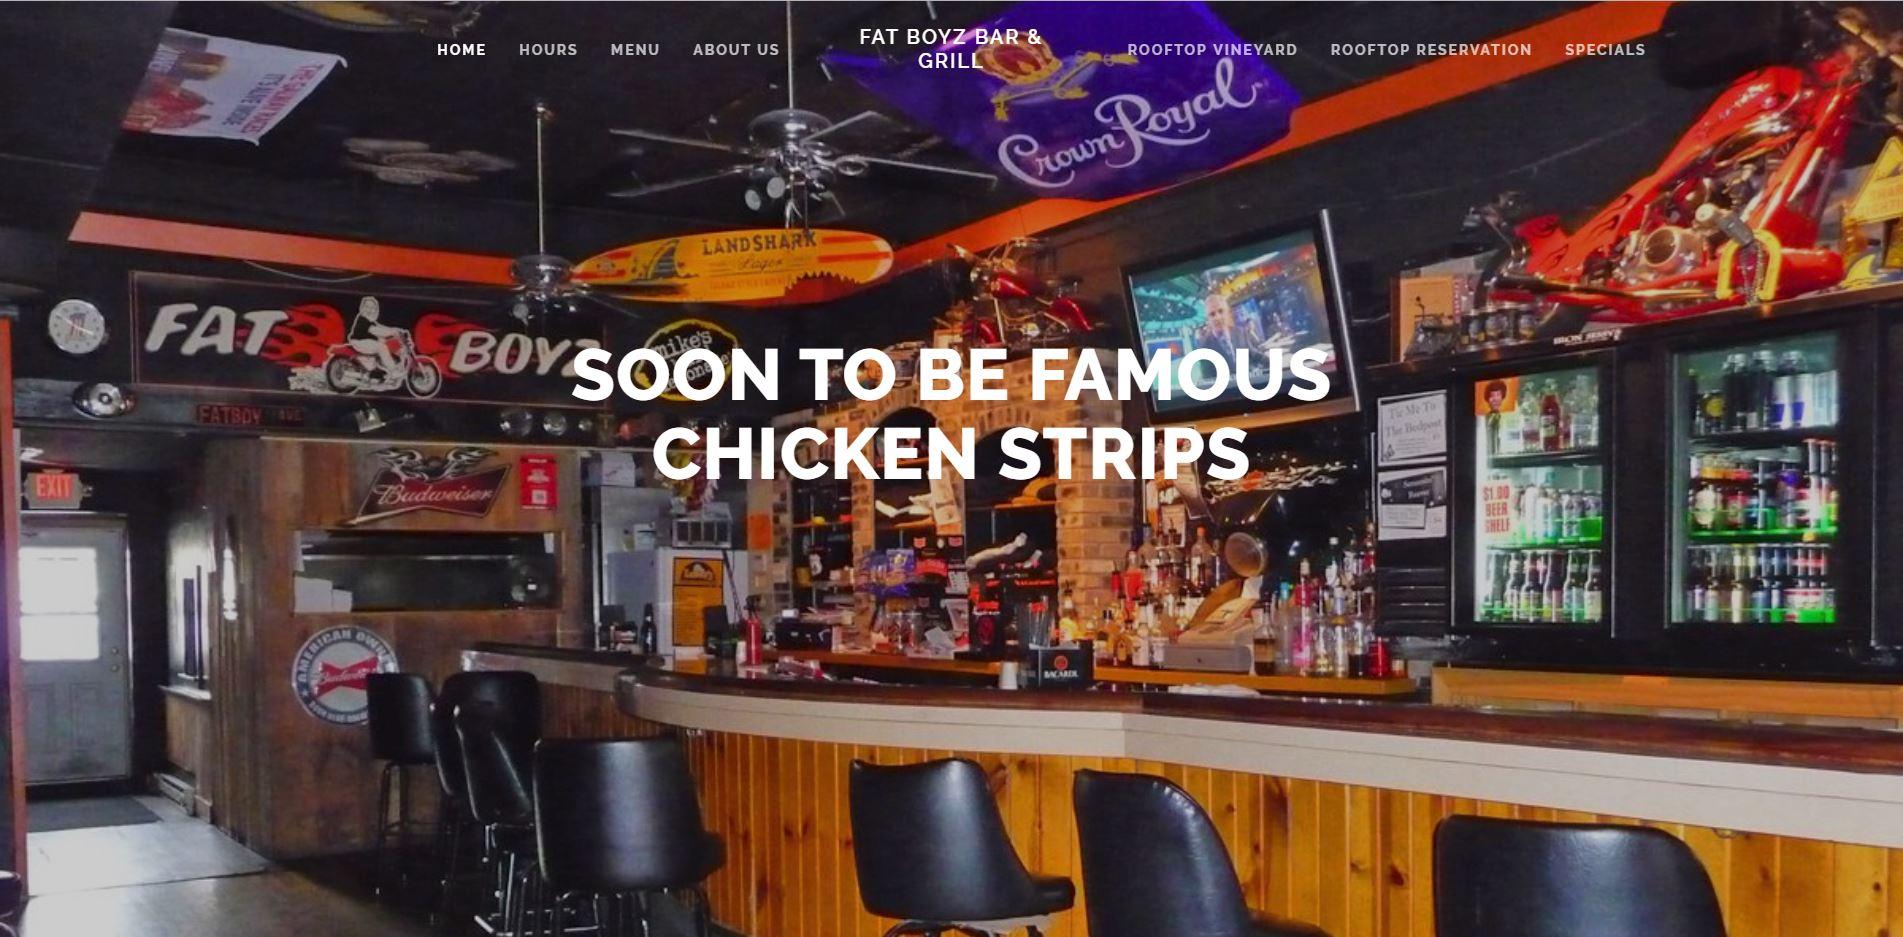 Fatboyzwebsite.JPG